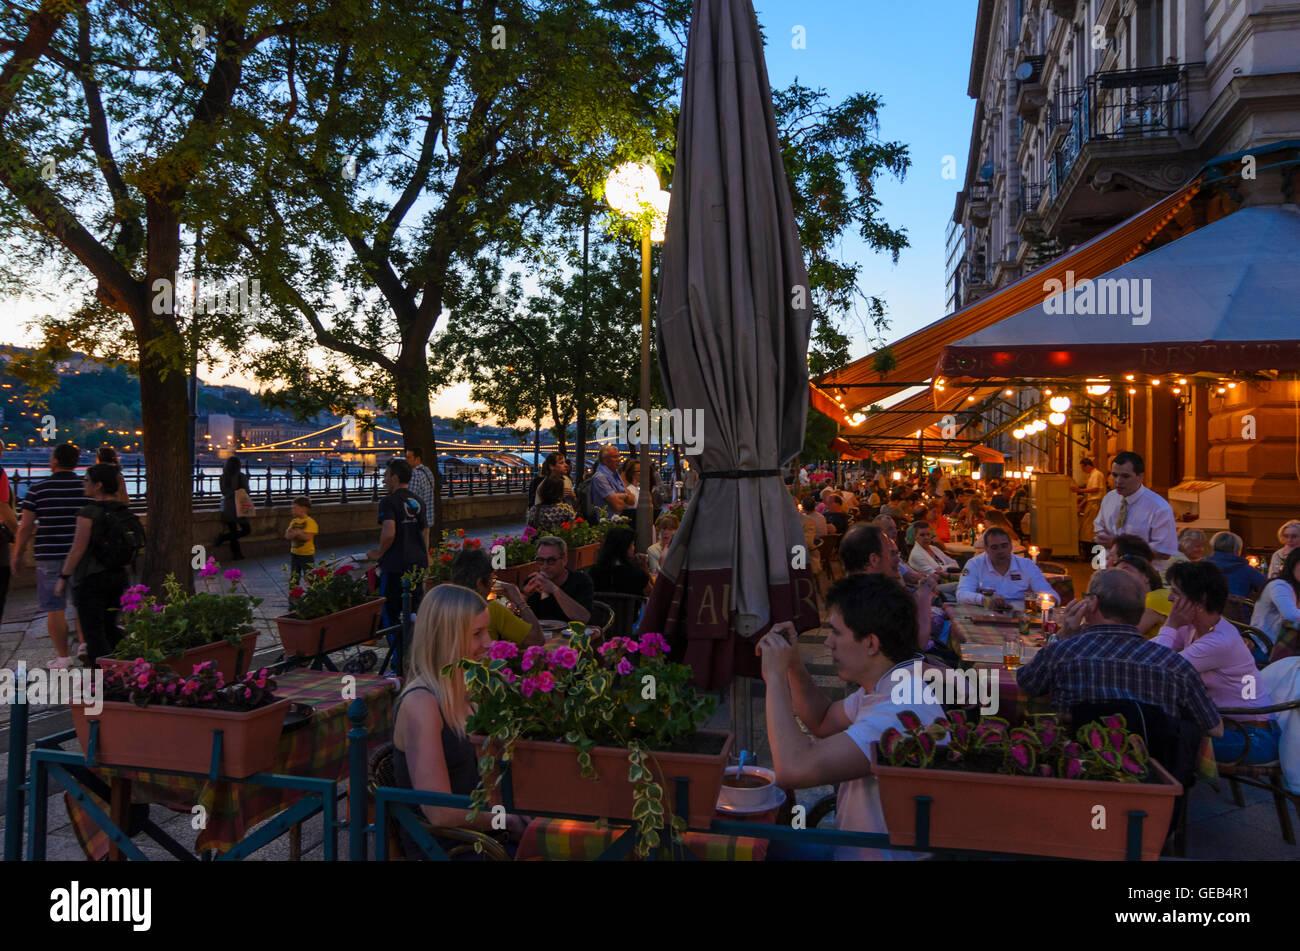 Budapest: Pedestrianized Danube Promenade on the Danube with Restaurant, Hungary, Budapest, - Stock Image